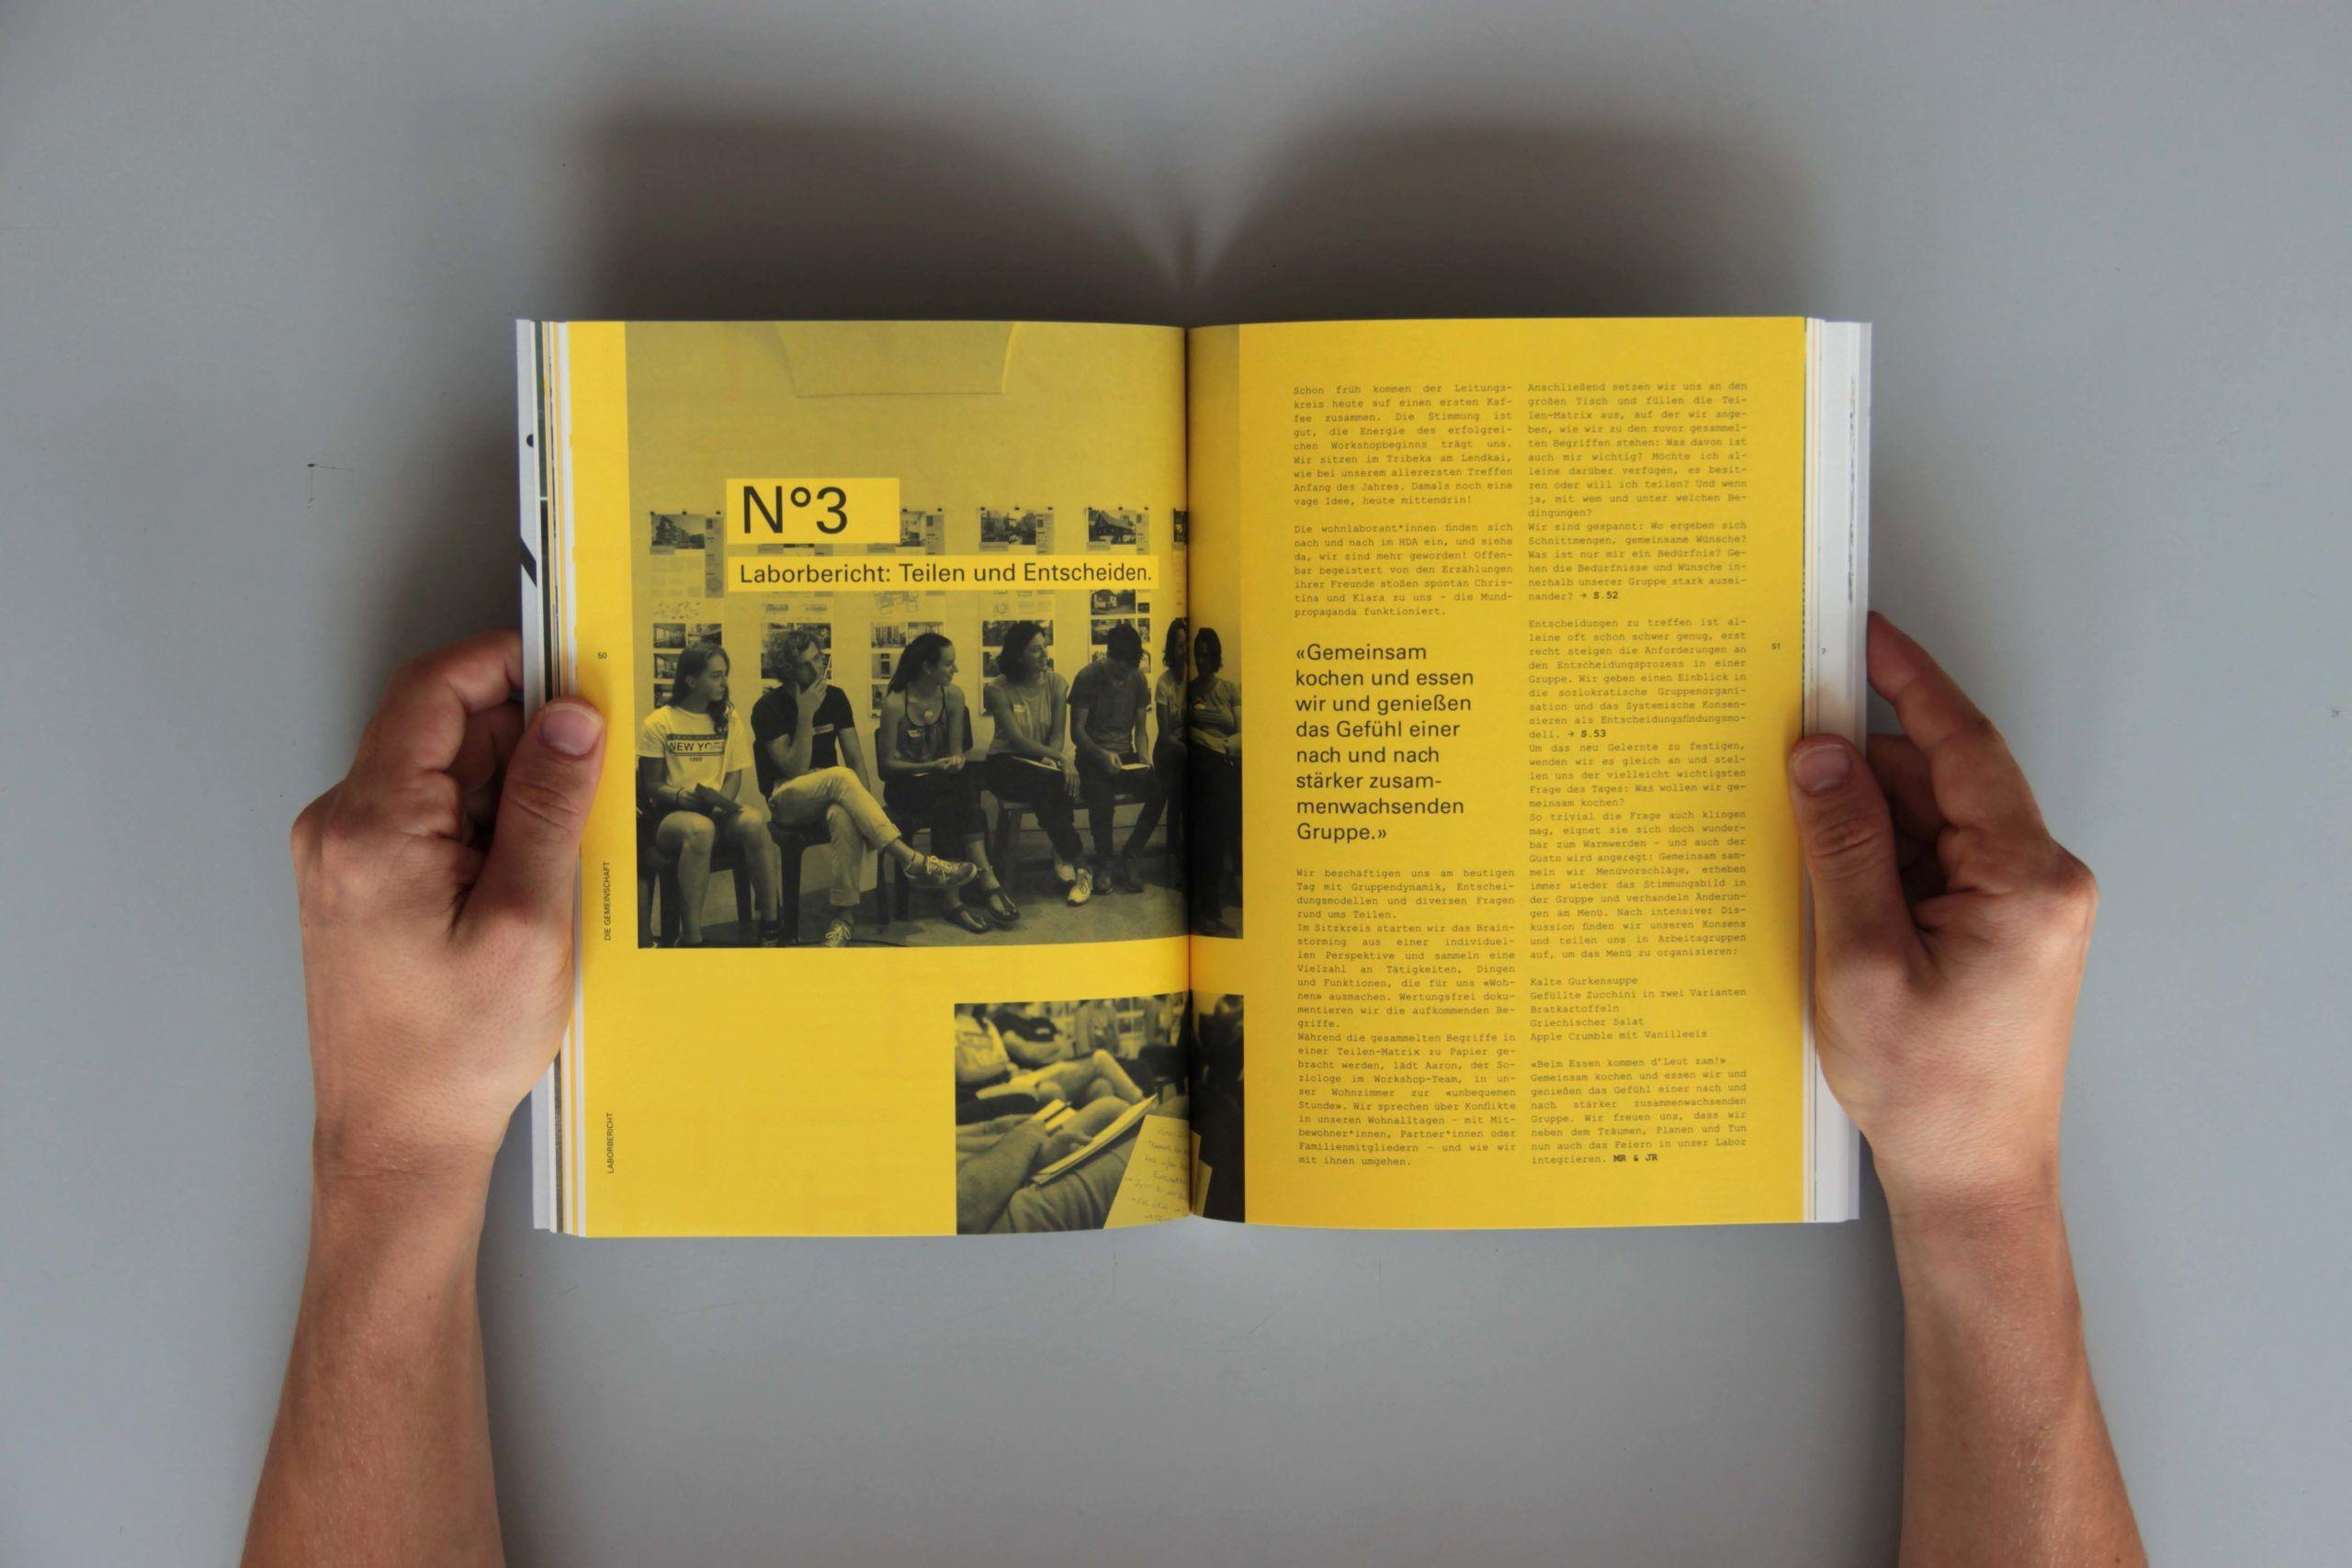 publikation10-©wohnlabor